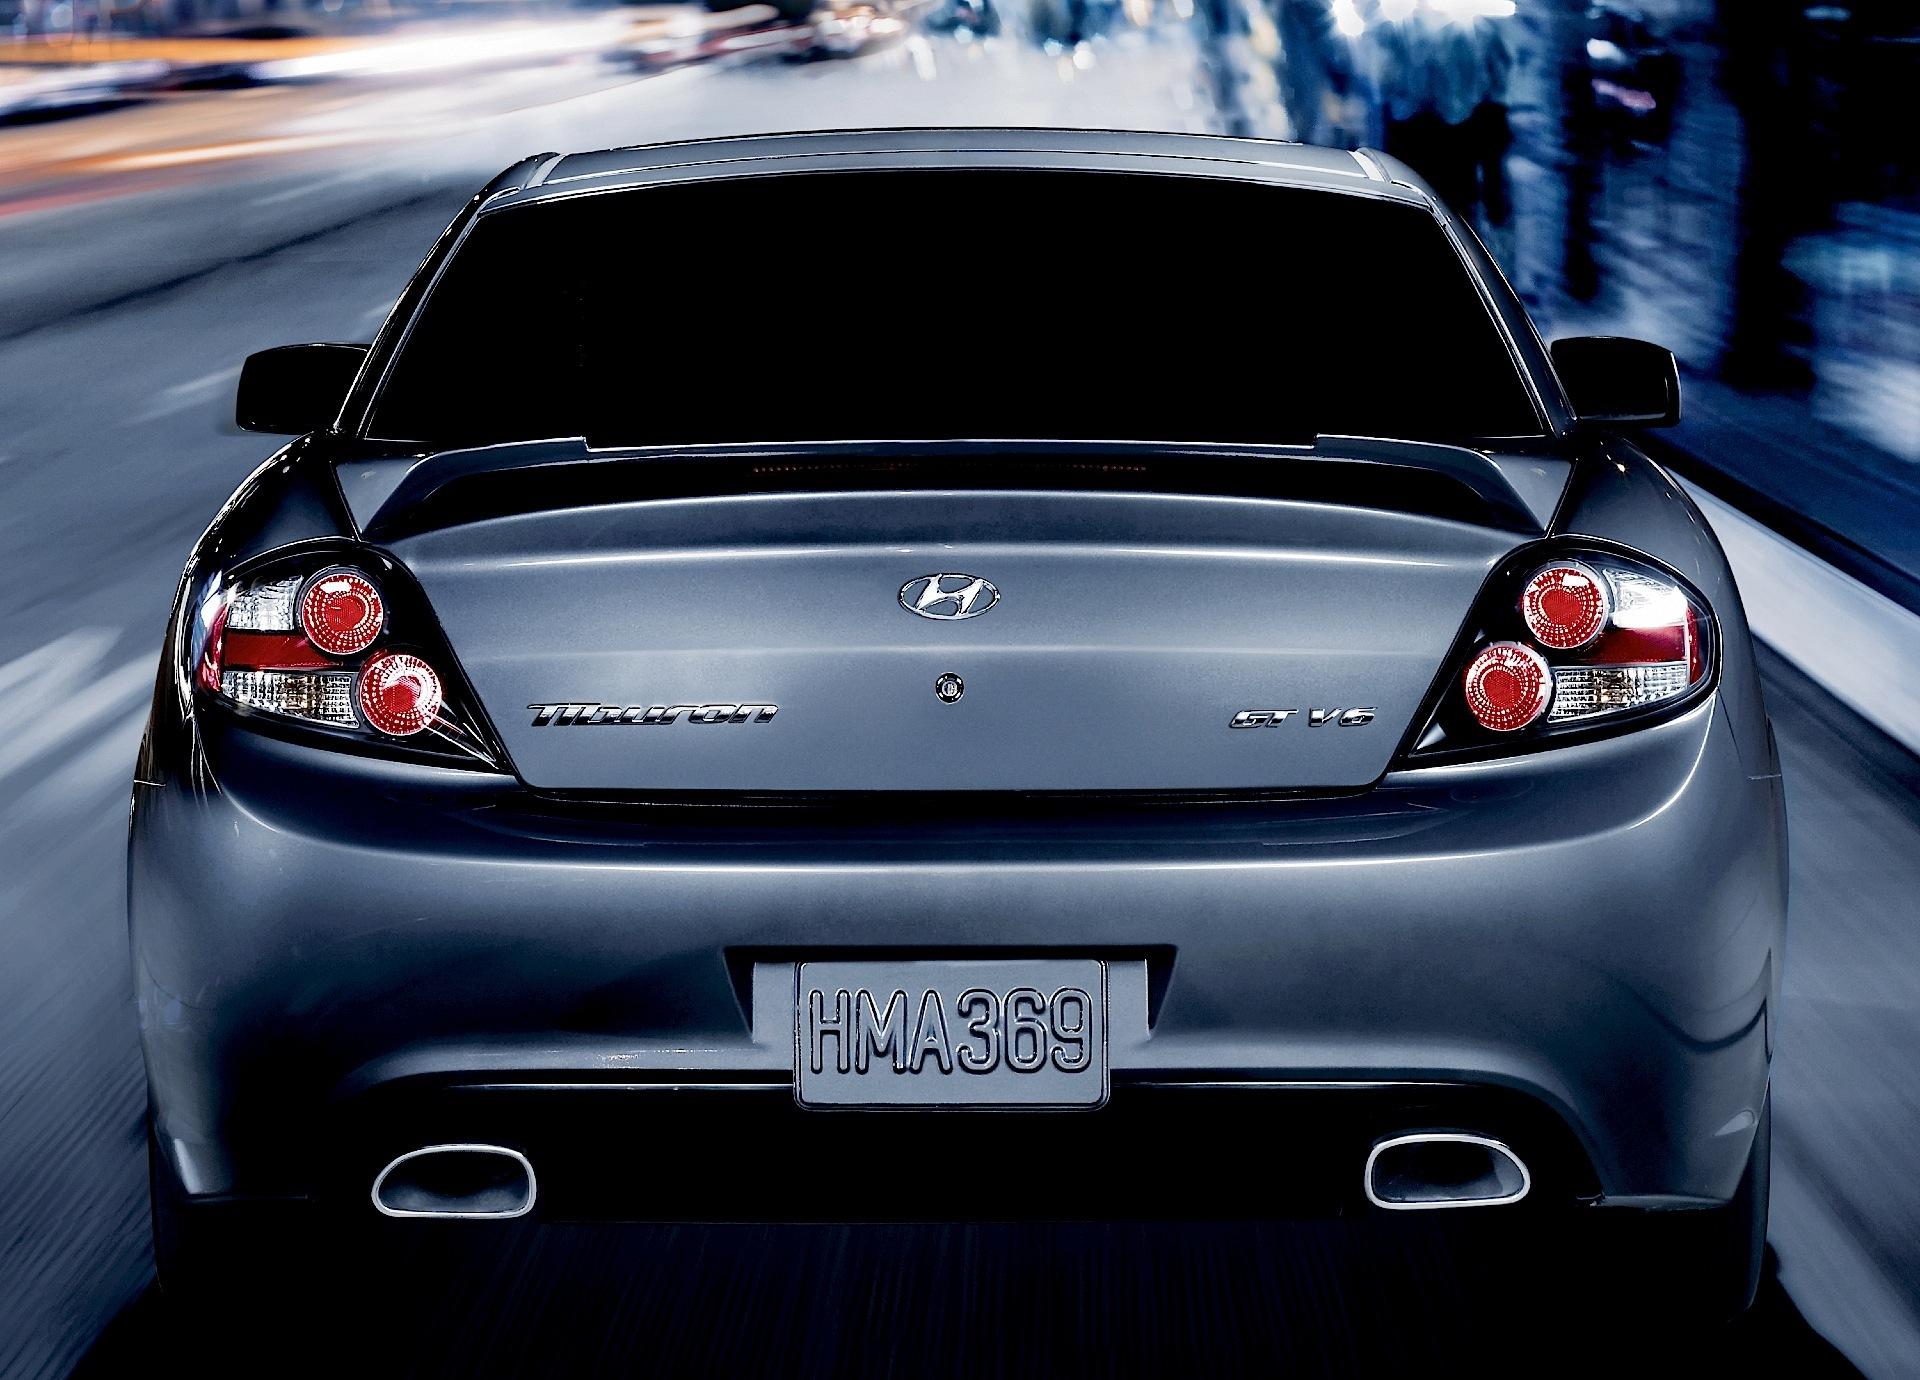 Hyundai Tuscani 2001 - 2009 Coupe #3